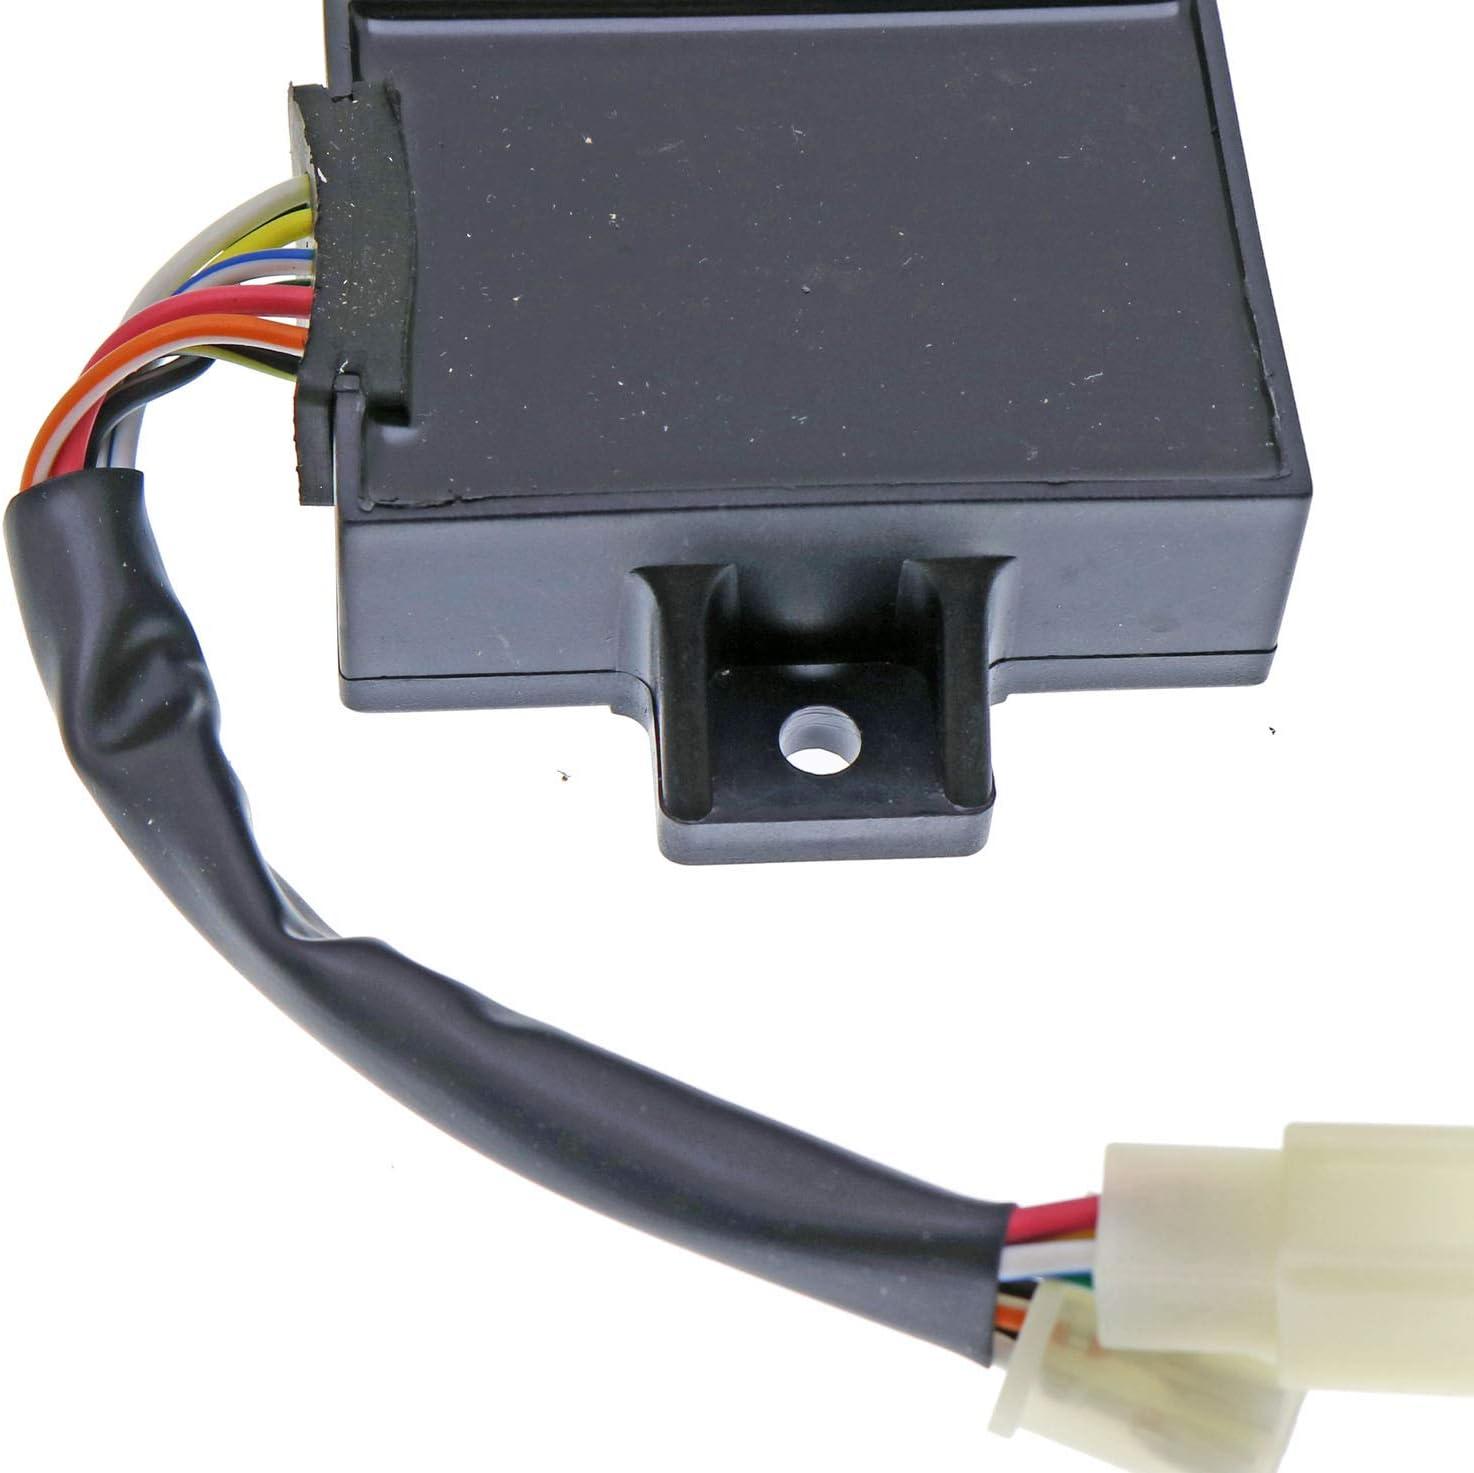 JEENDA Ignitor CDI Box 21119-2157 Igniter Compatible with Kawasaki Mule 2500 Mule 2510 Mule 2520 2007 /& Prior